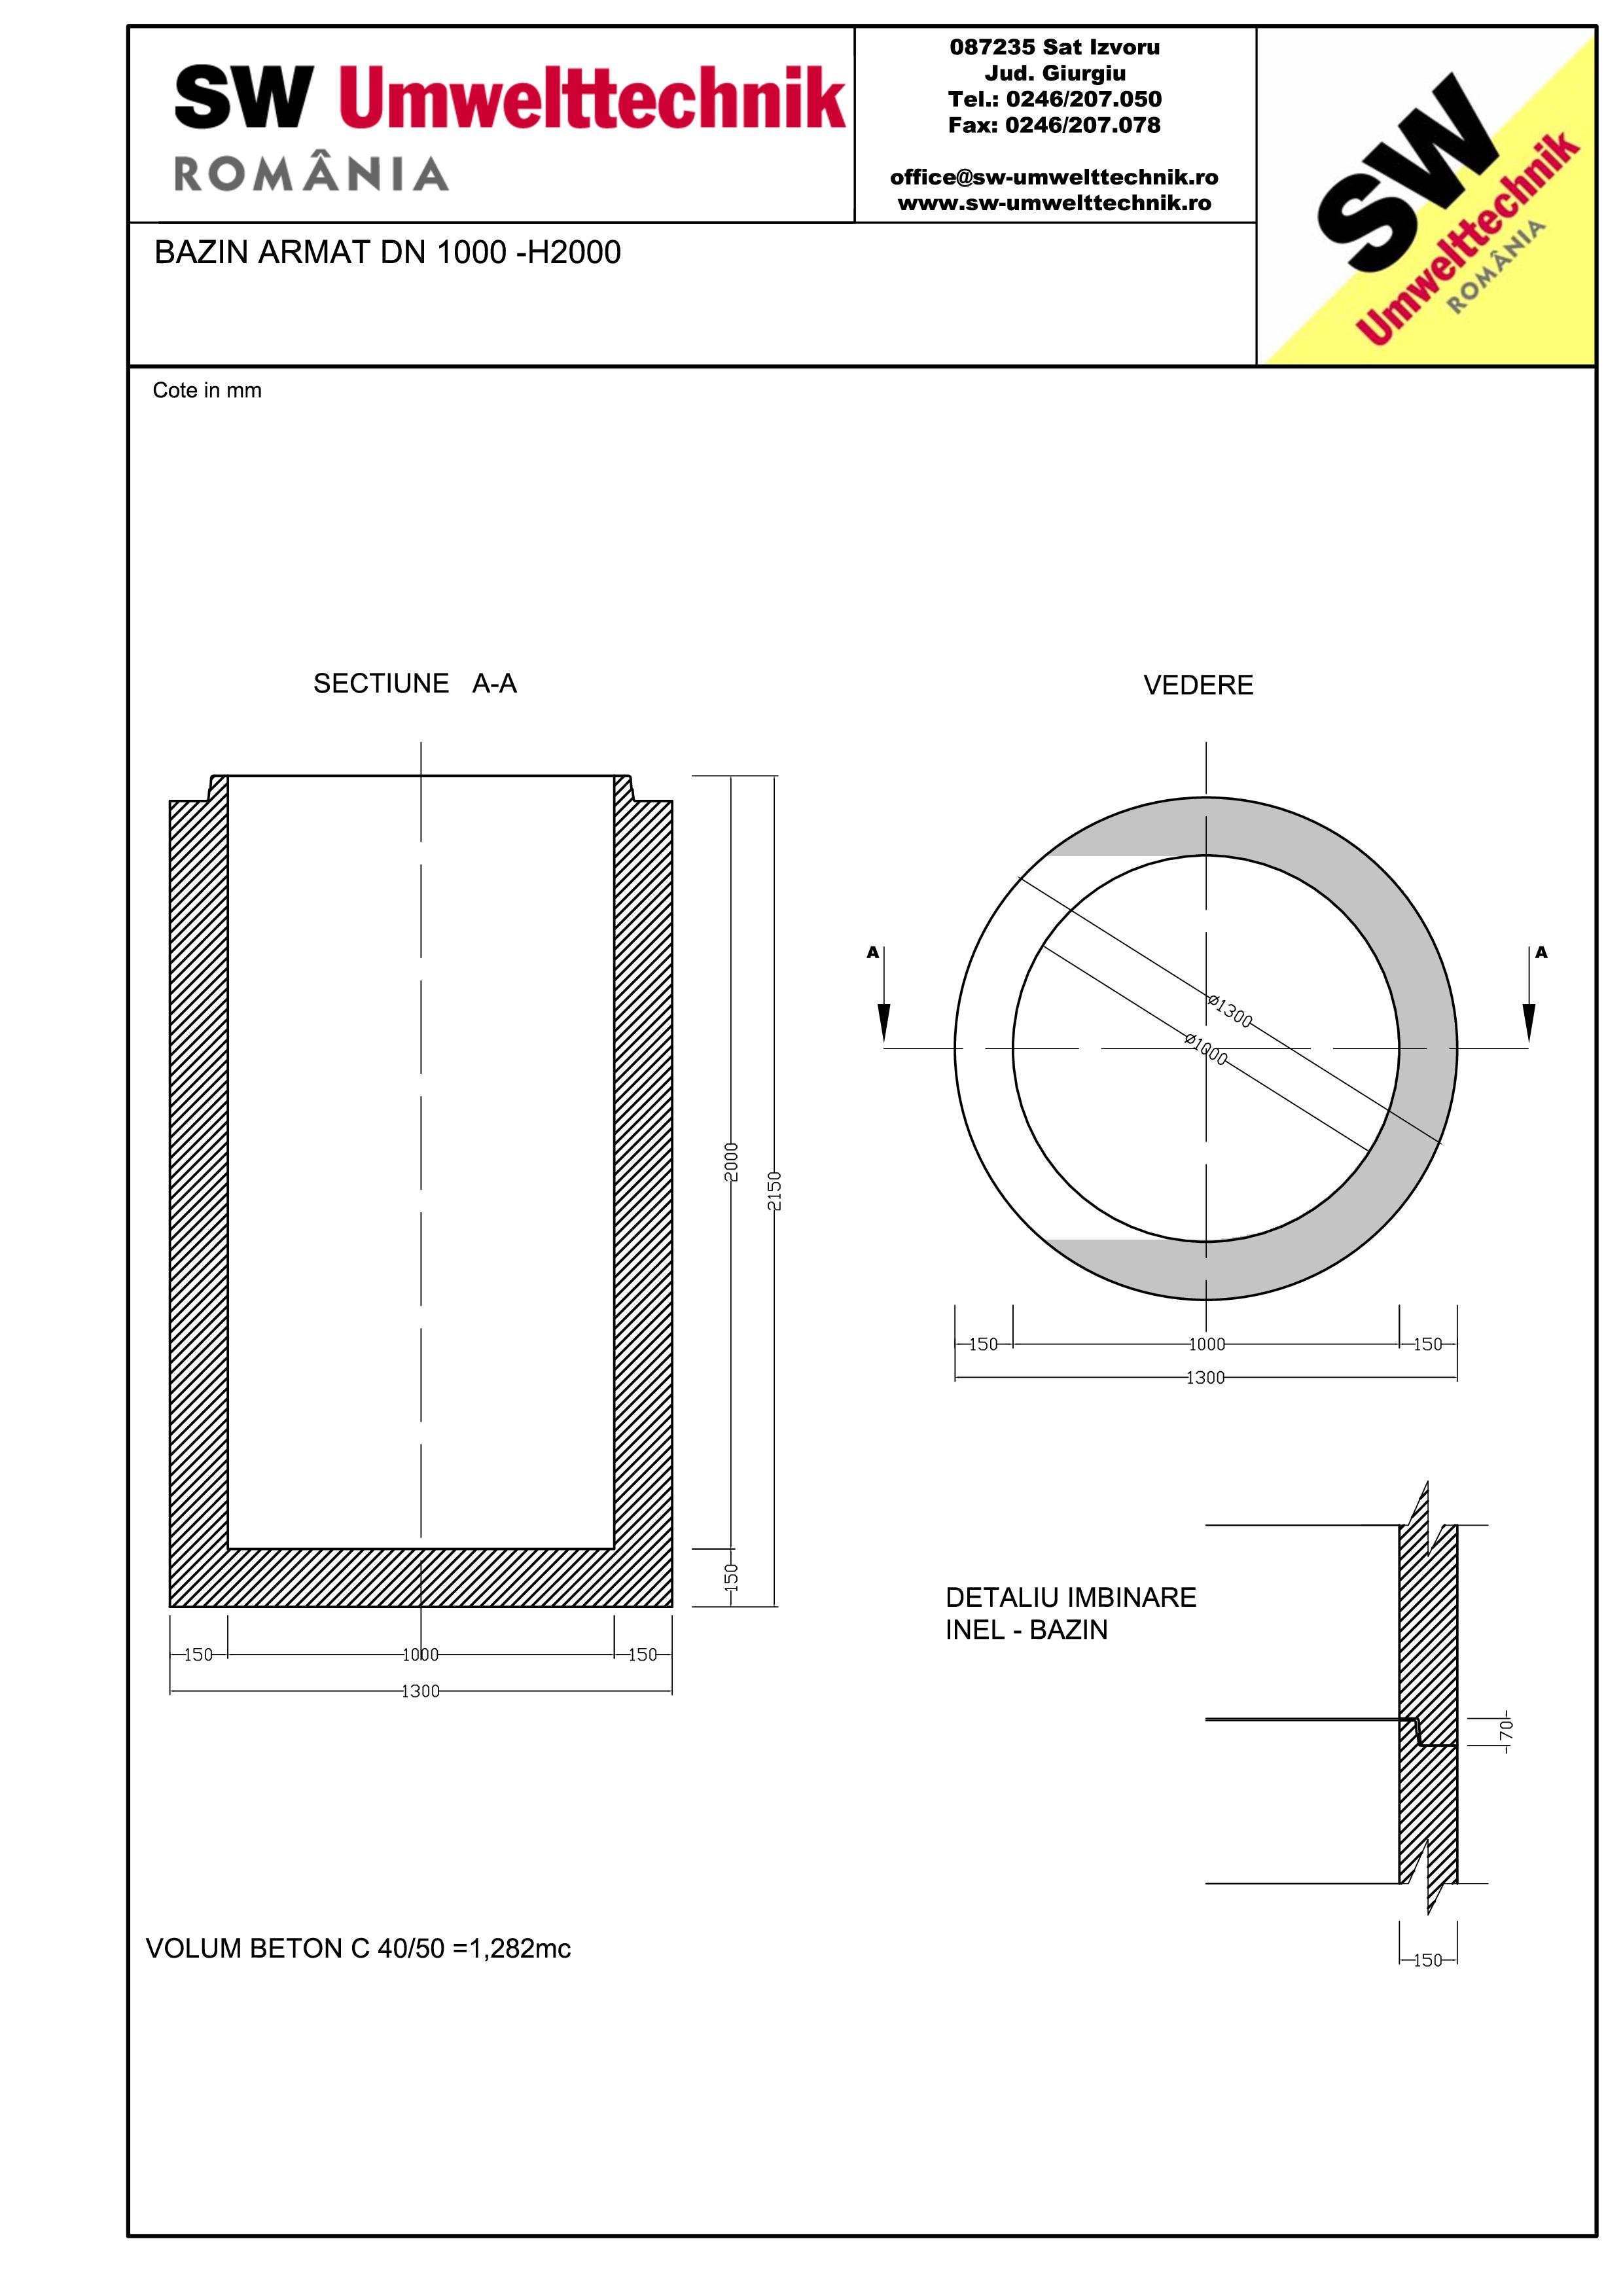 Pagina 1 - CAD-PDF Bazin armat DN1000 H2000 SW UMWELTTECHNIK Detaliu de produs